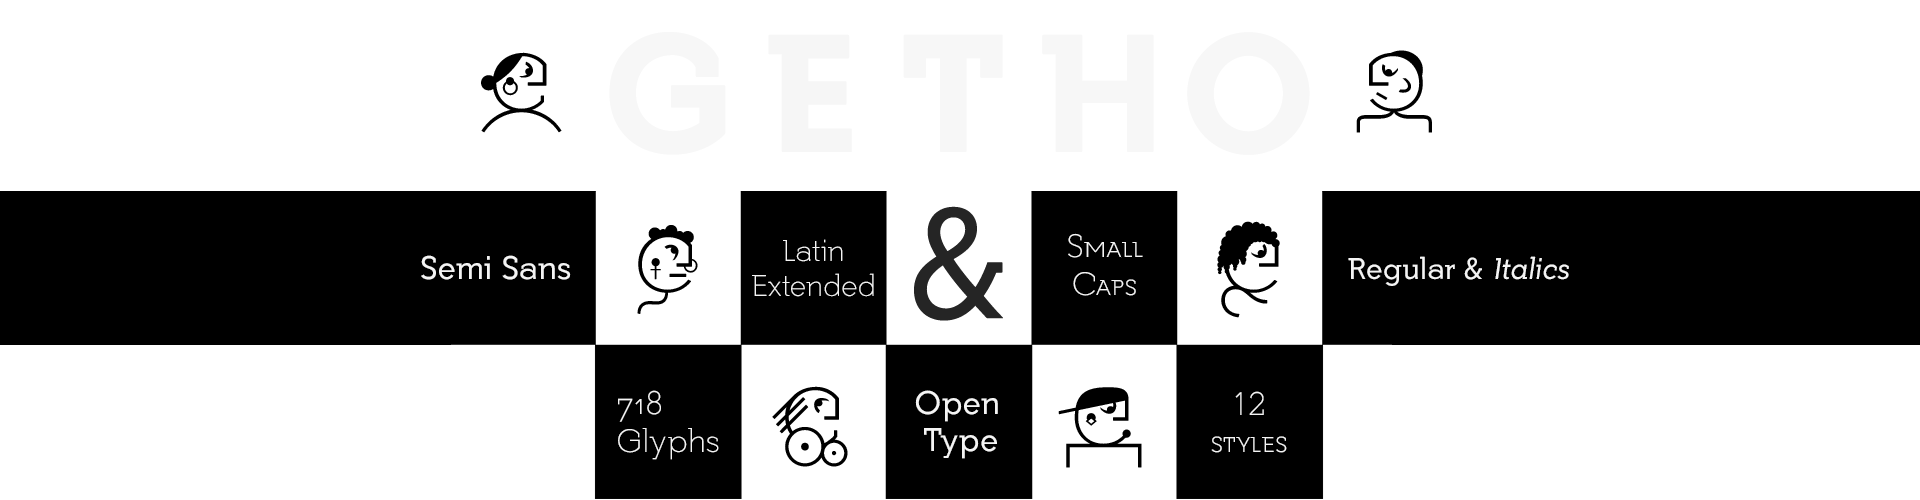 Getho Semi Sans Fonts & Small Caps Family